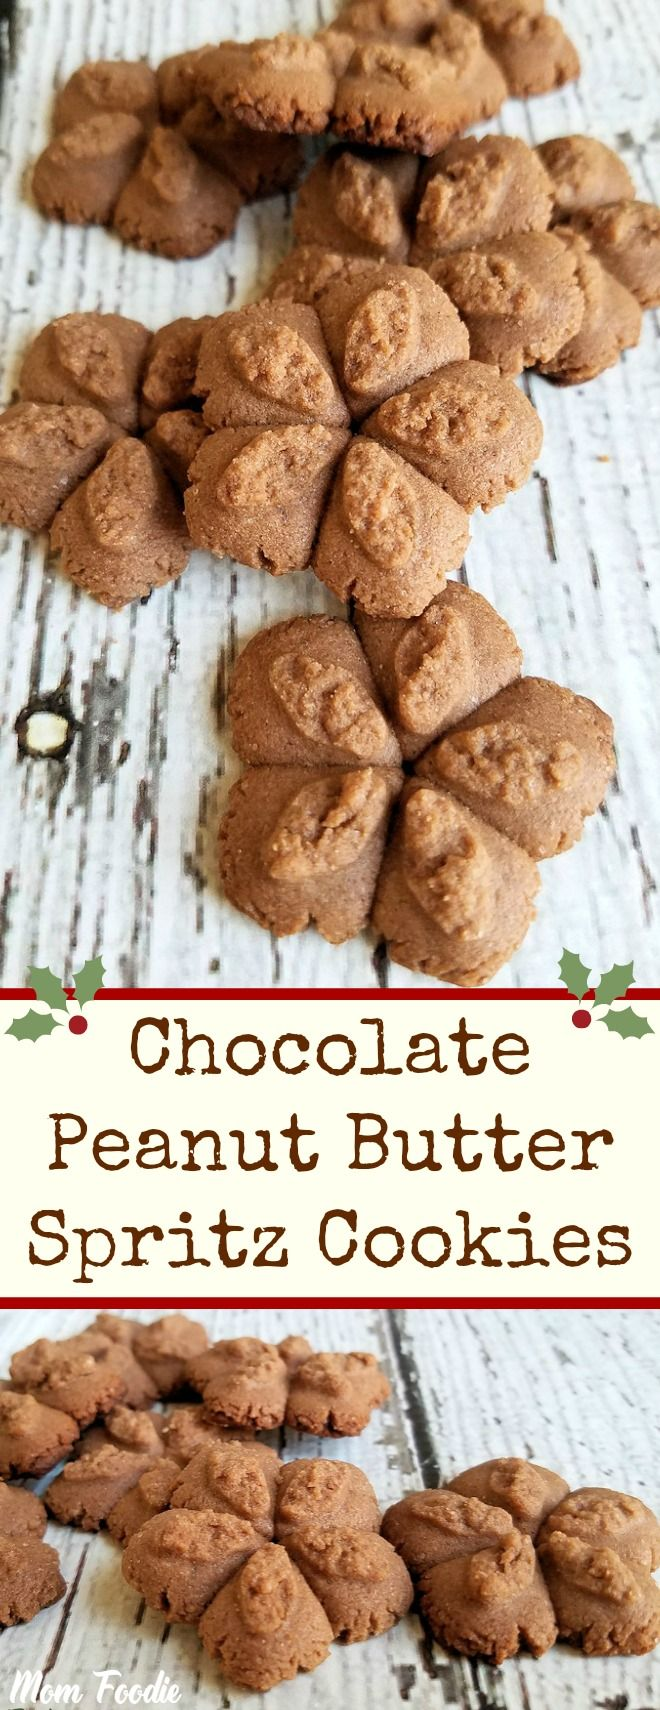 Chocolate Peanut Butter Spritz Cookies Recipe